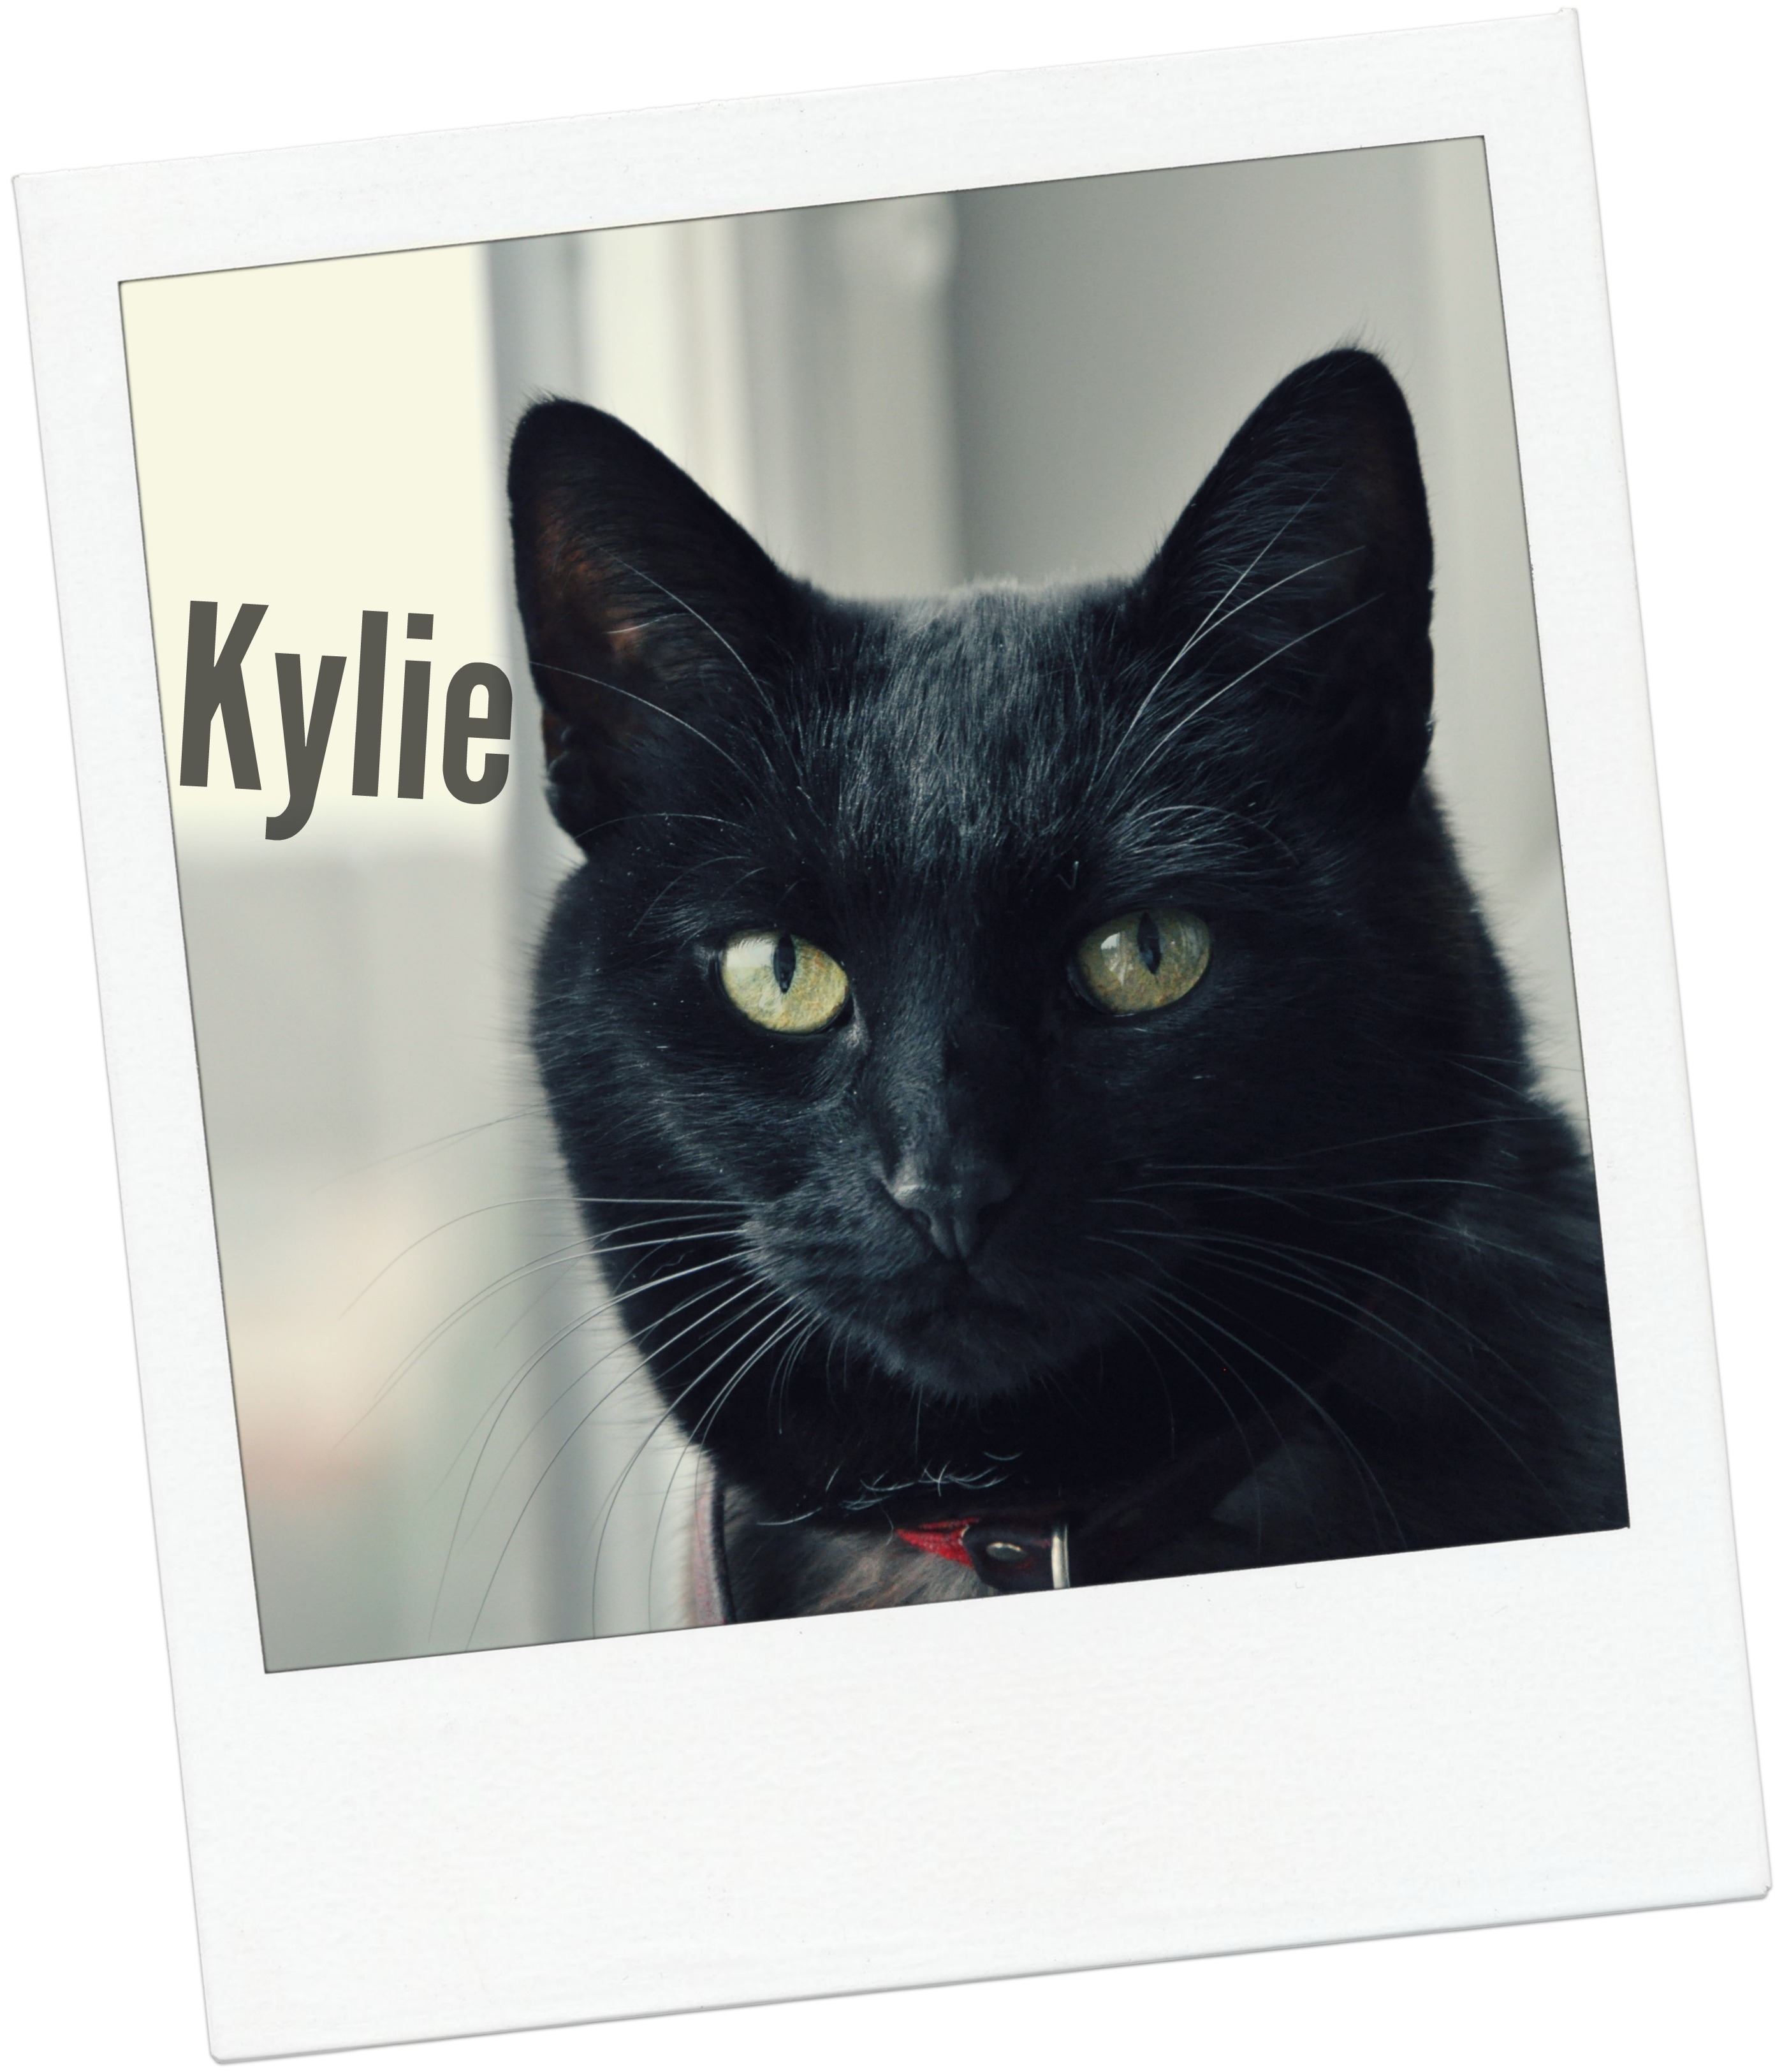 Kylie blog